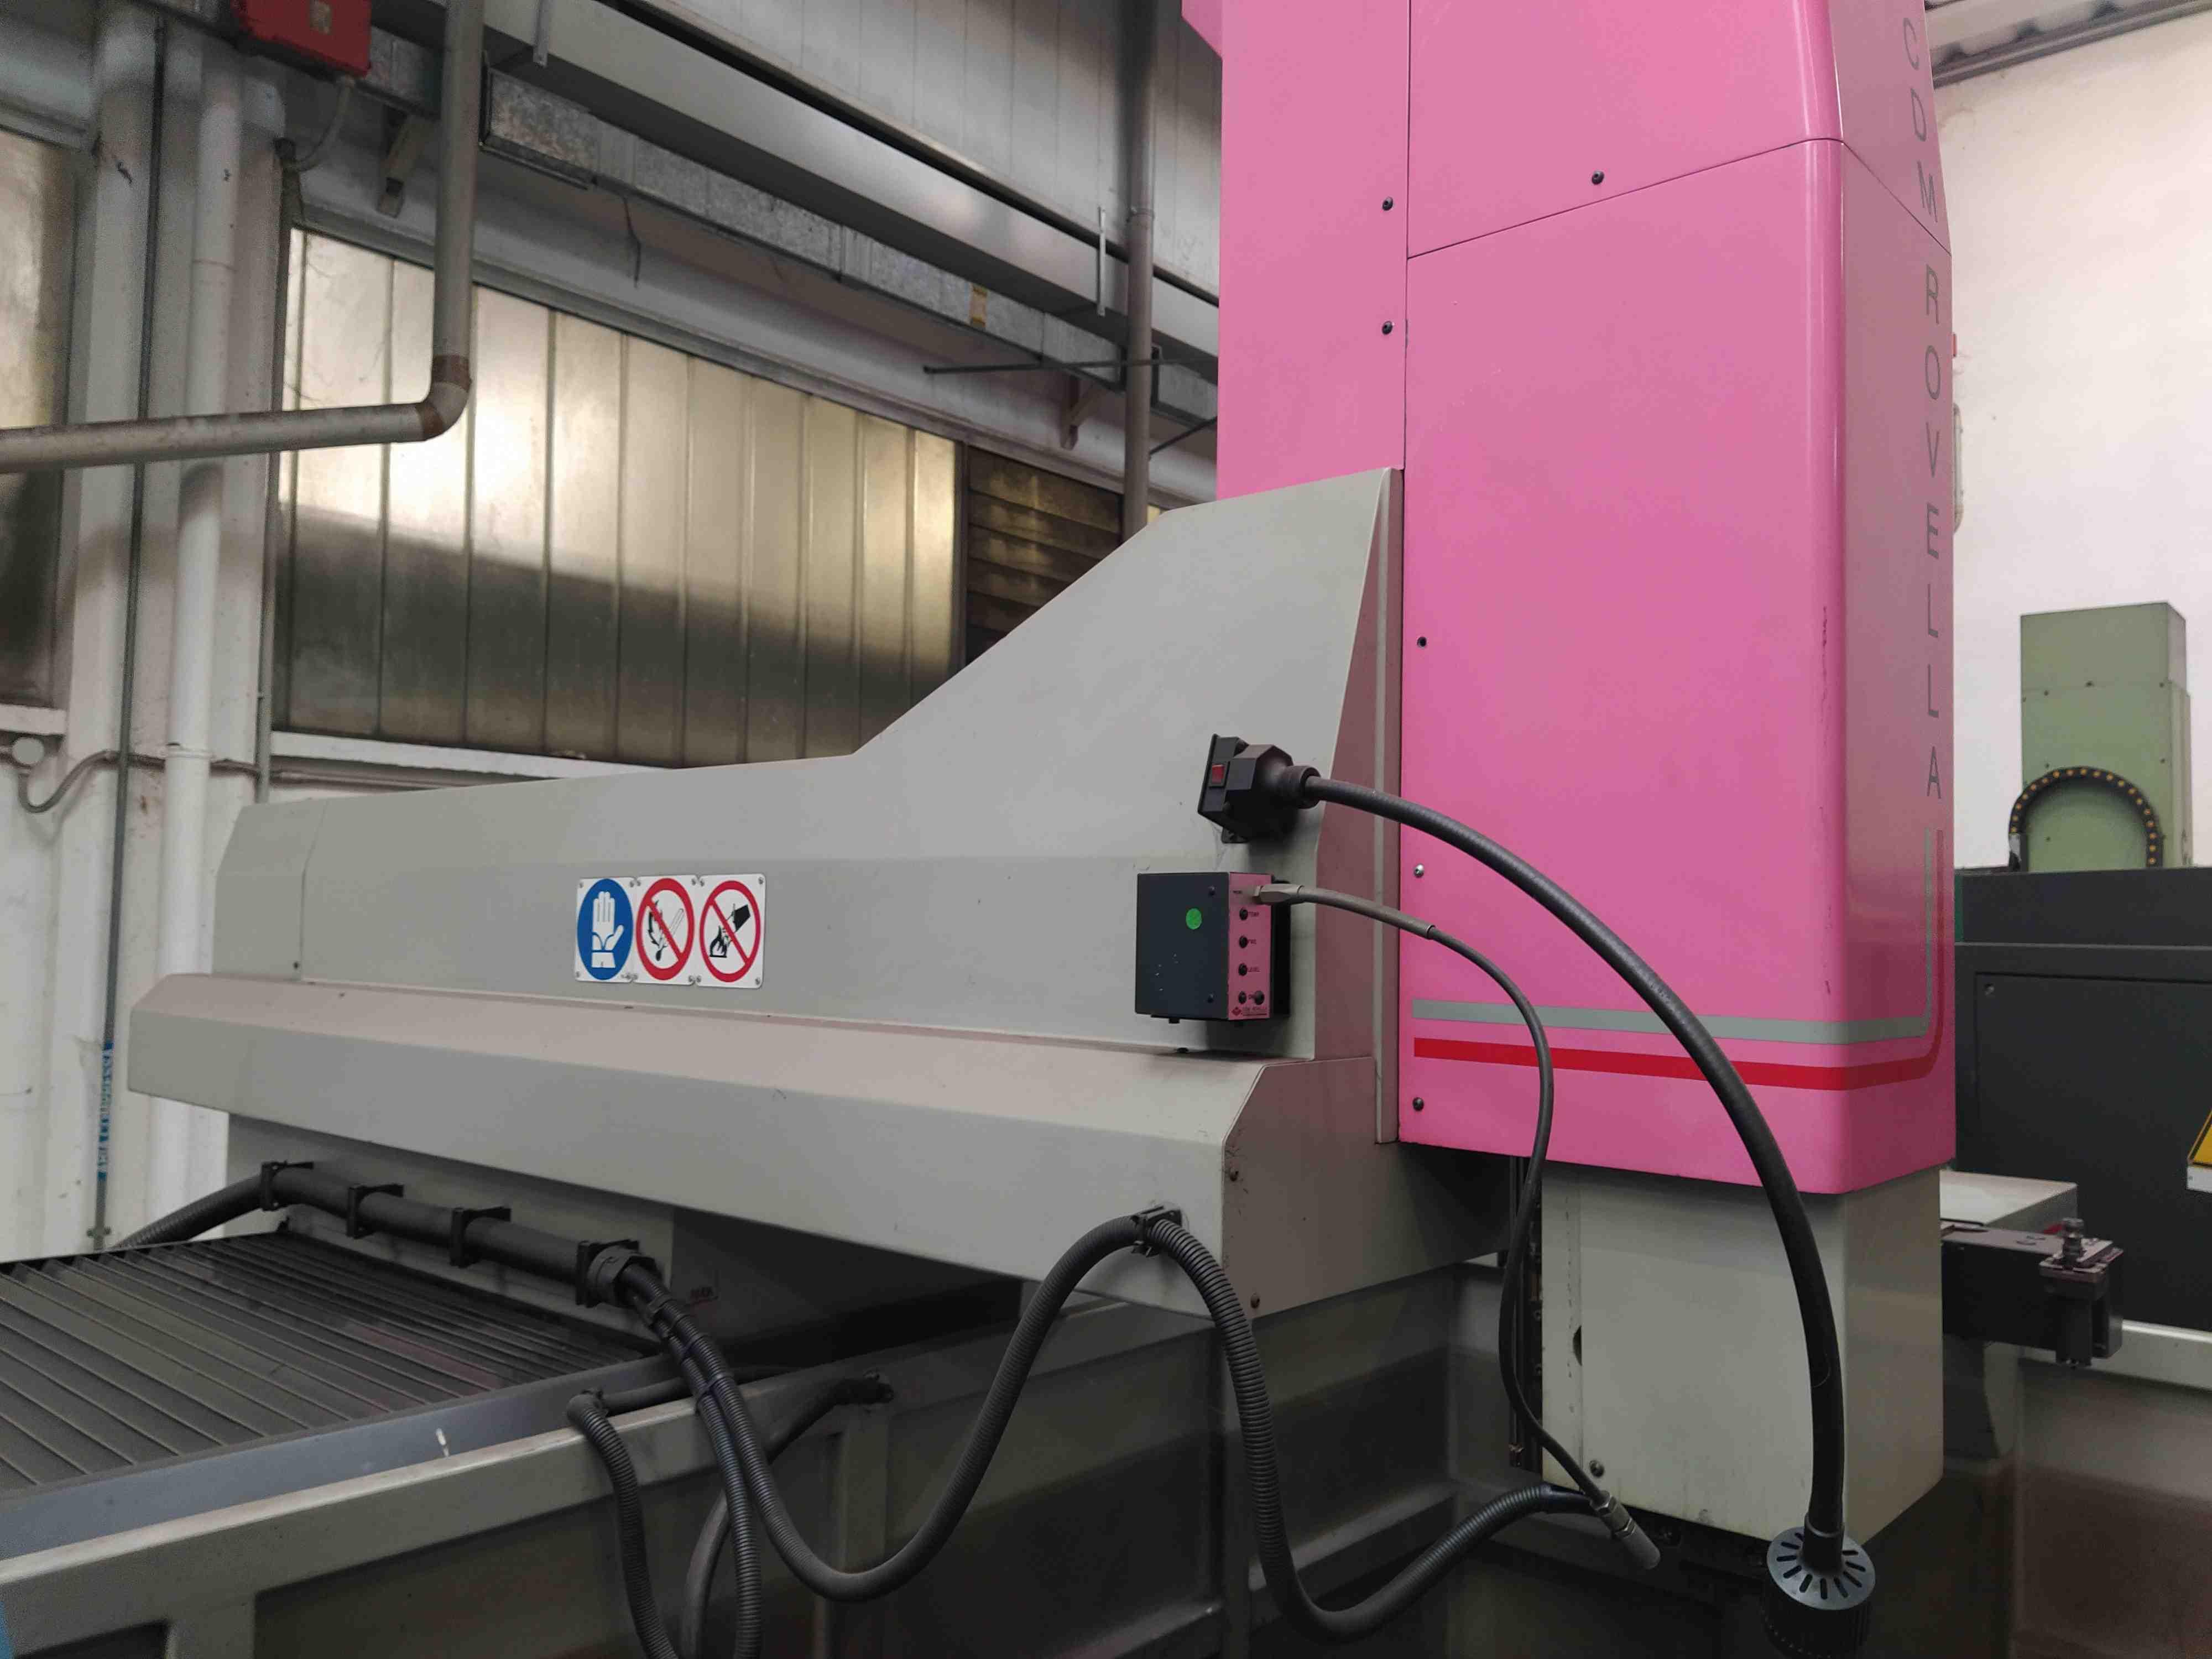 Elettroerosione a CNC CDM Rovella BF 1300 ZENIT in vendita - foto 2